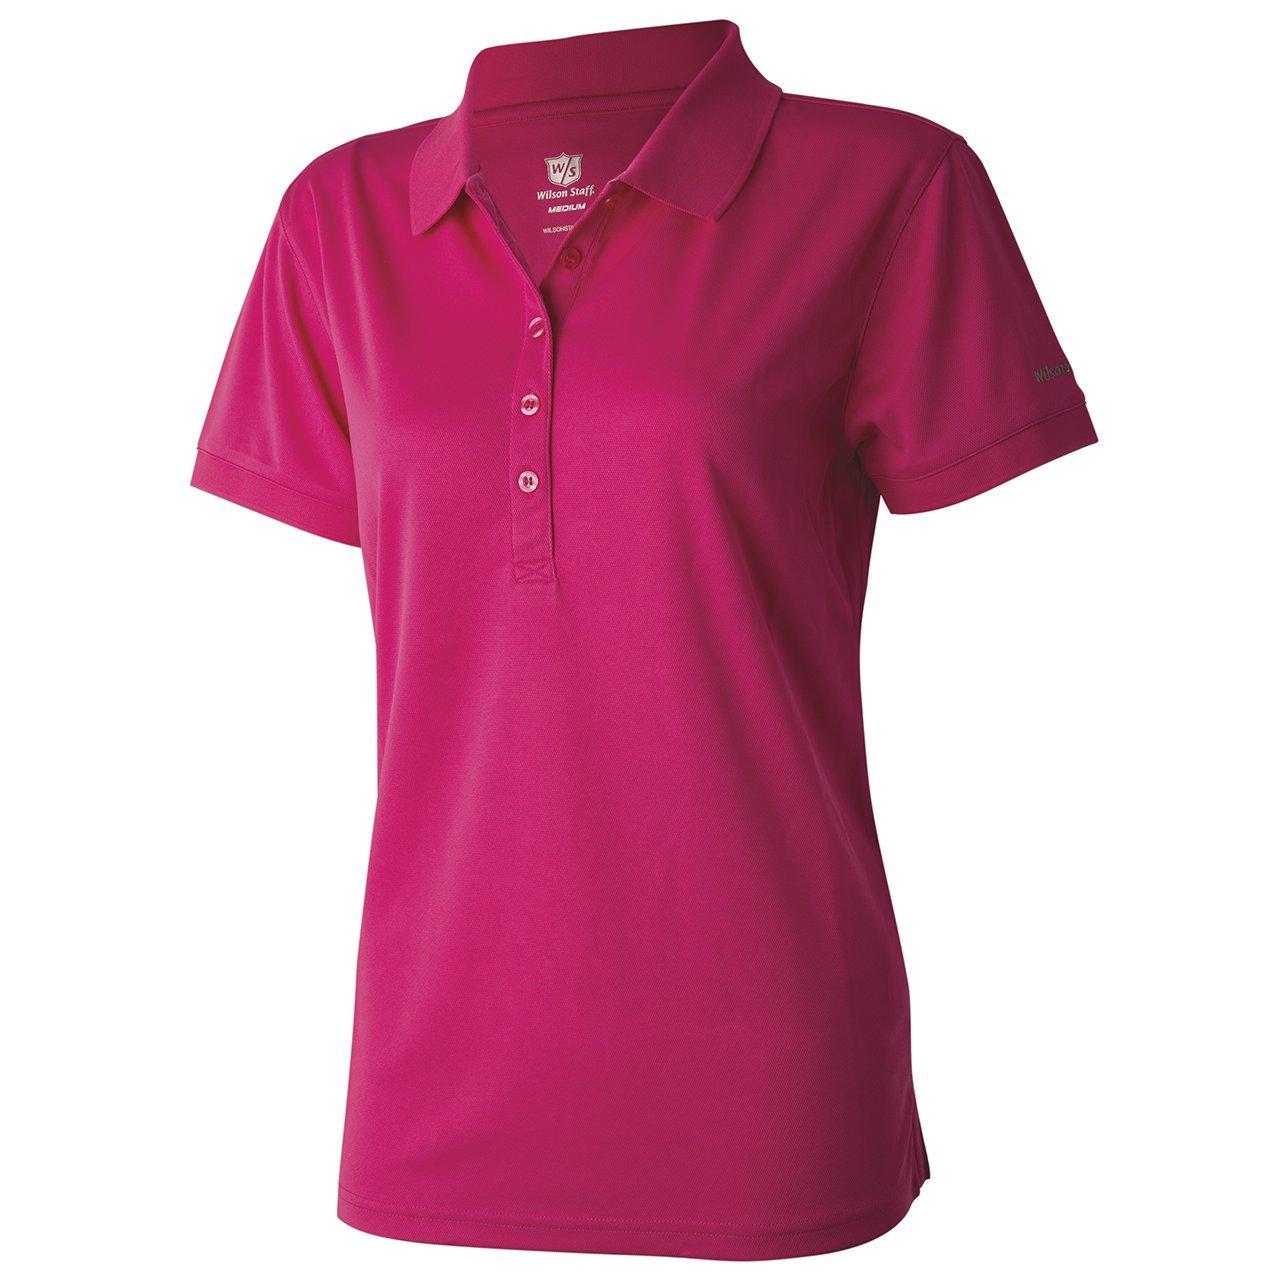 Wilson Staff Ladies Authentic de Polo Camiseta Magenta Color ...